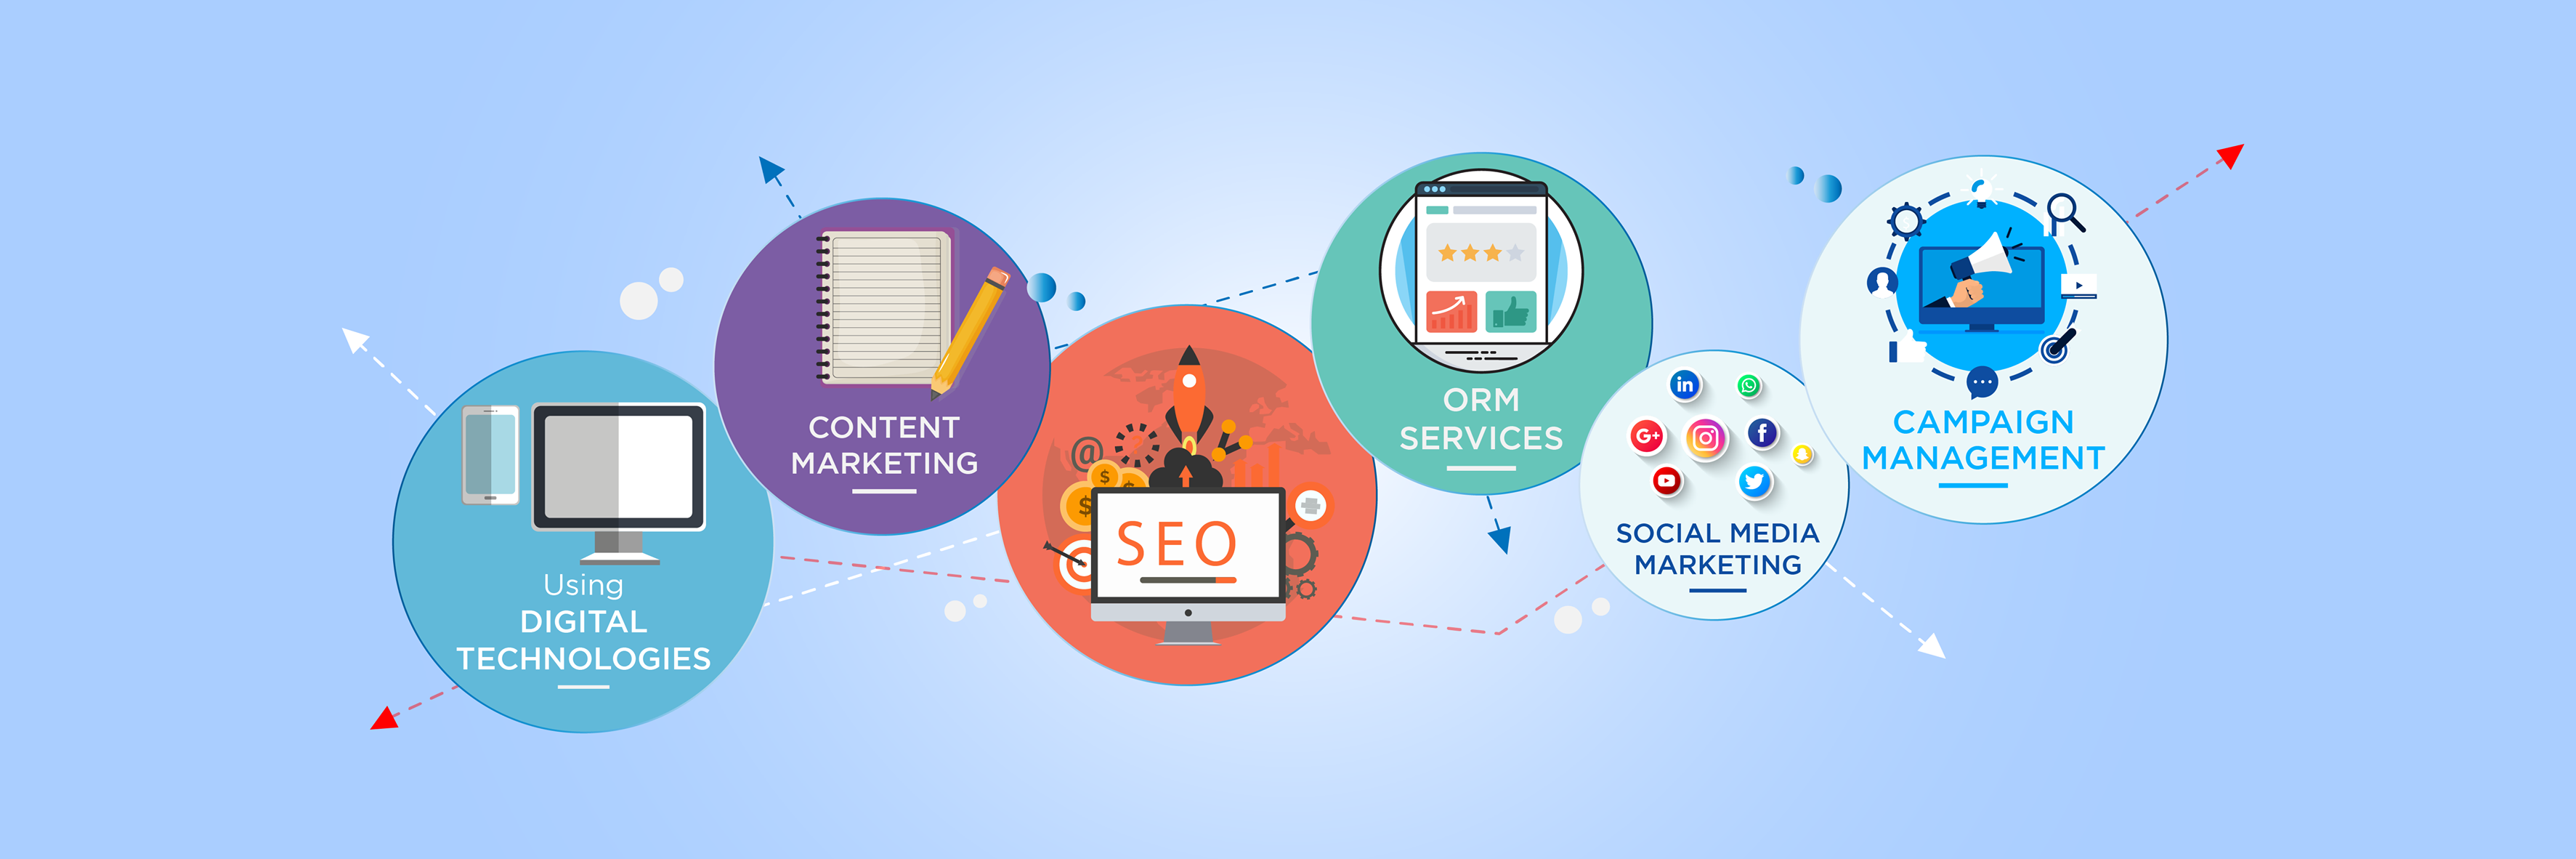 GeeksChip Digital Marketing Company